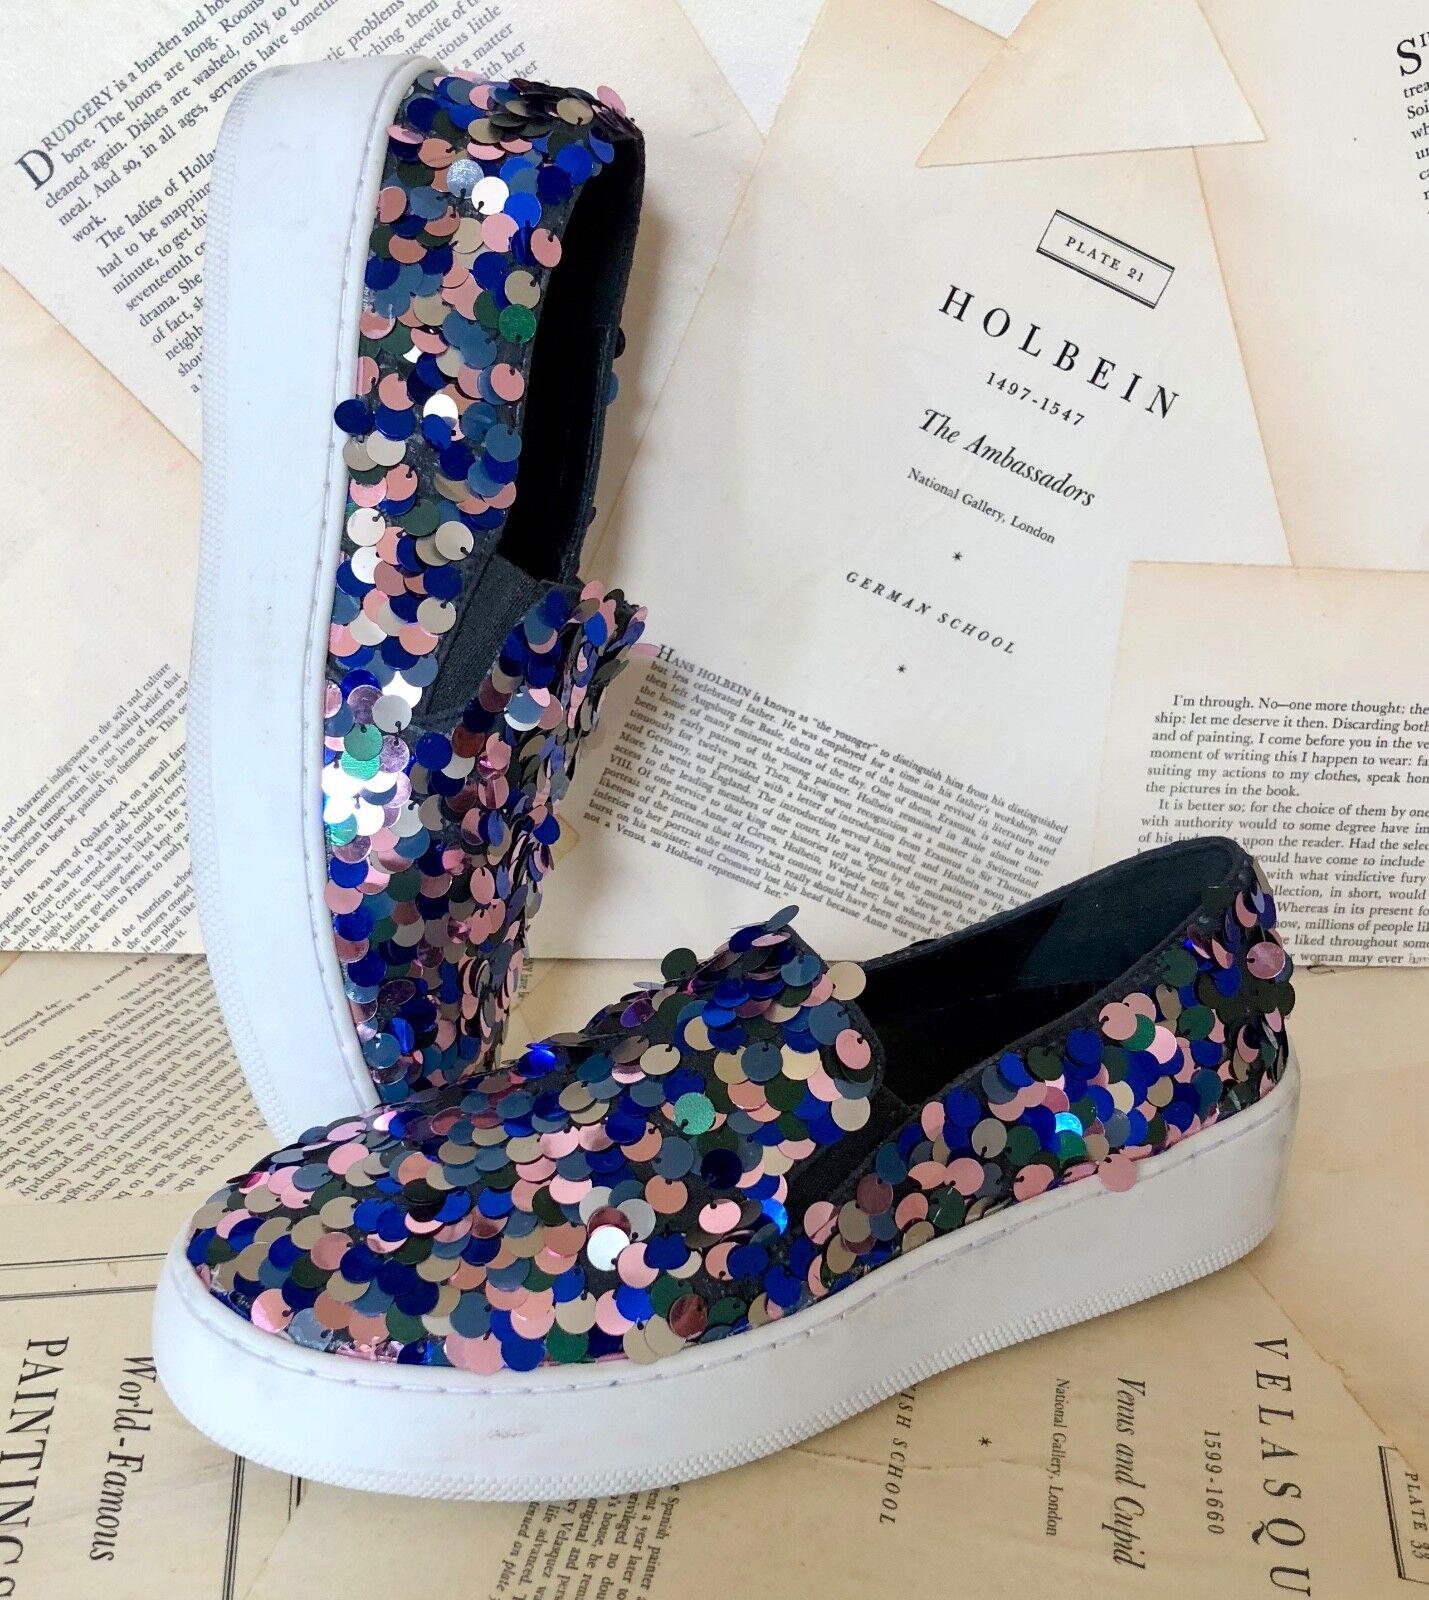 NEW Blau Free People silver pink Blau NEW Multi Farbe Sequin Slip On Sneakers 36 / 5.5-6 e269b2